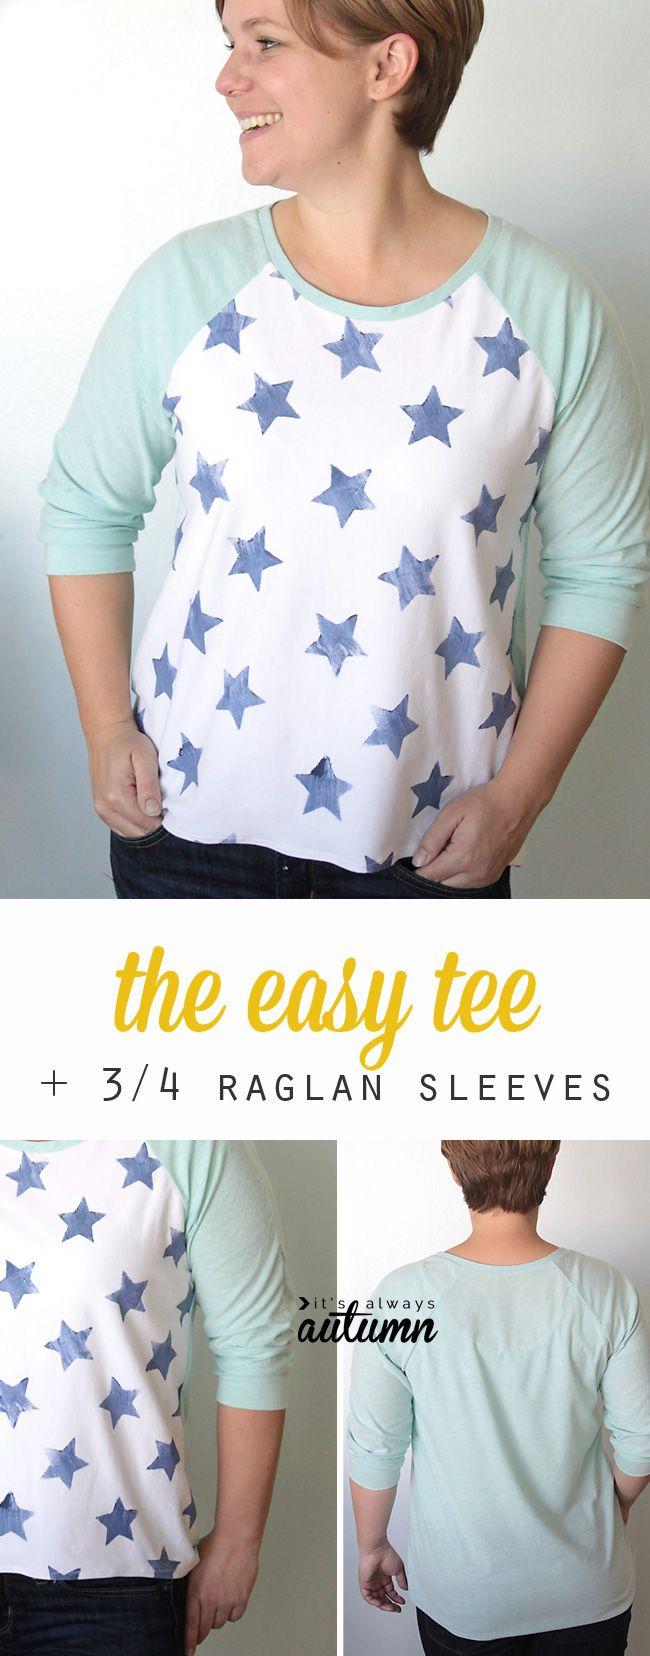 the easy tee {the hand stamped 3/4 raglan sleeve version | Nähen ...